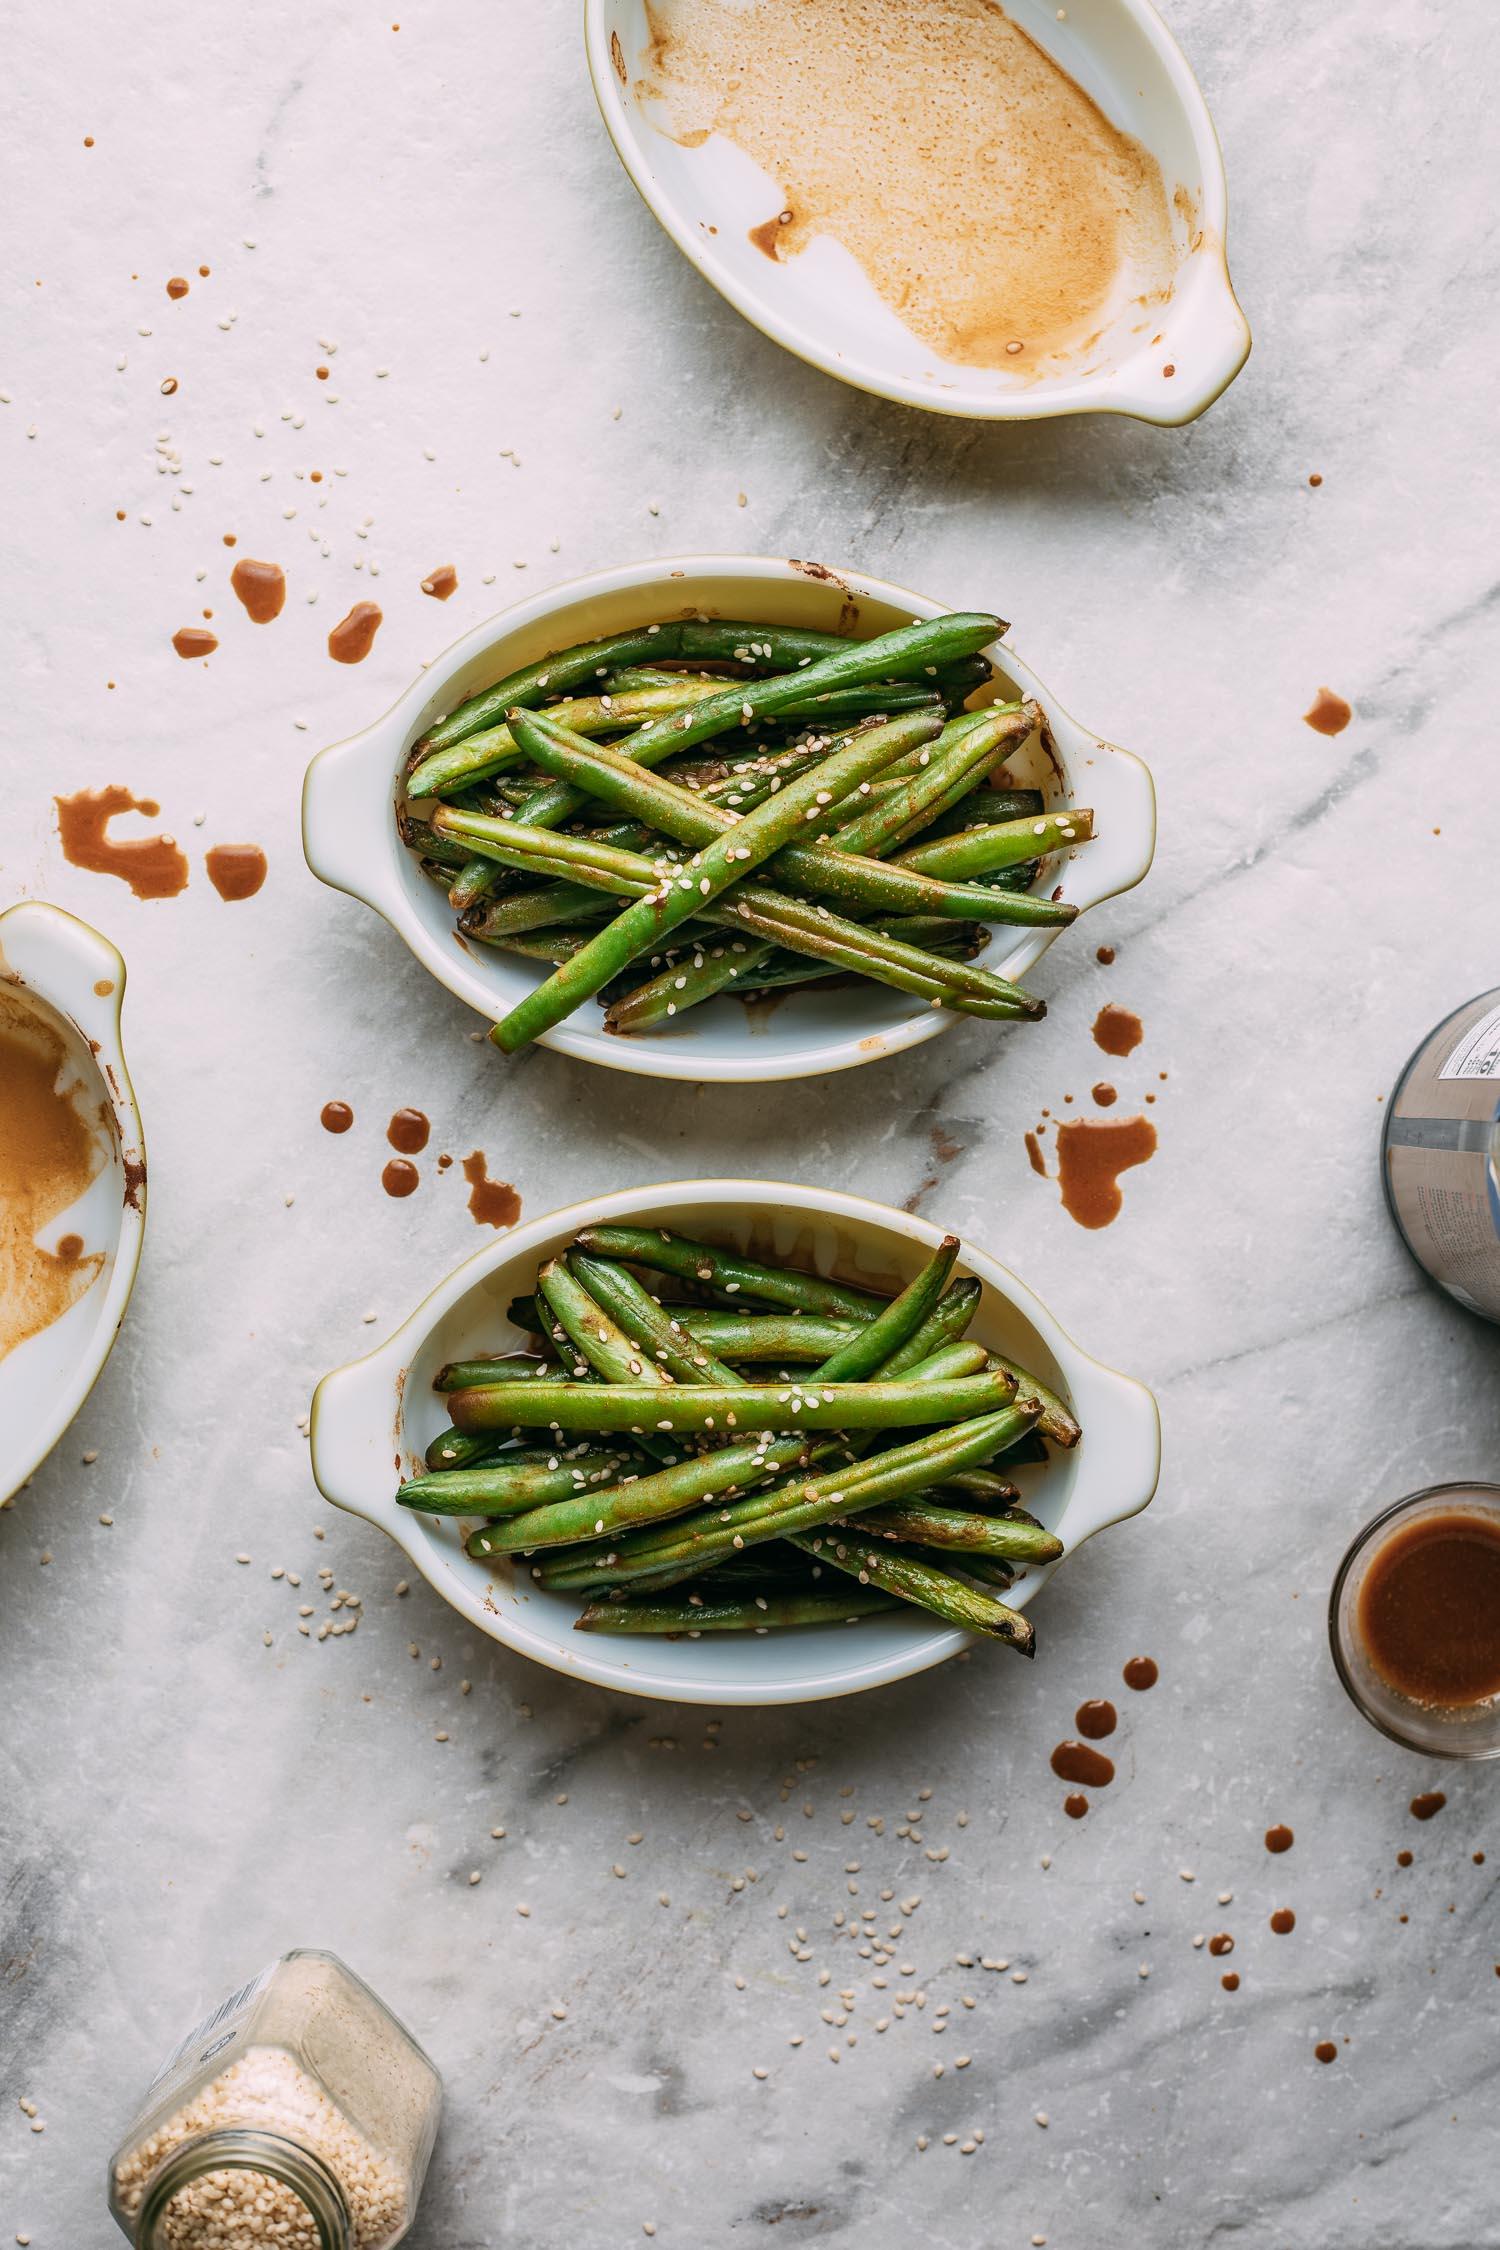 easy fresh green beans, with splattered tahini sauce